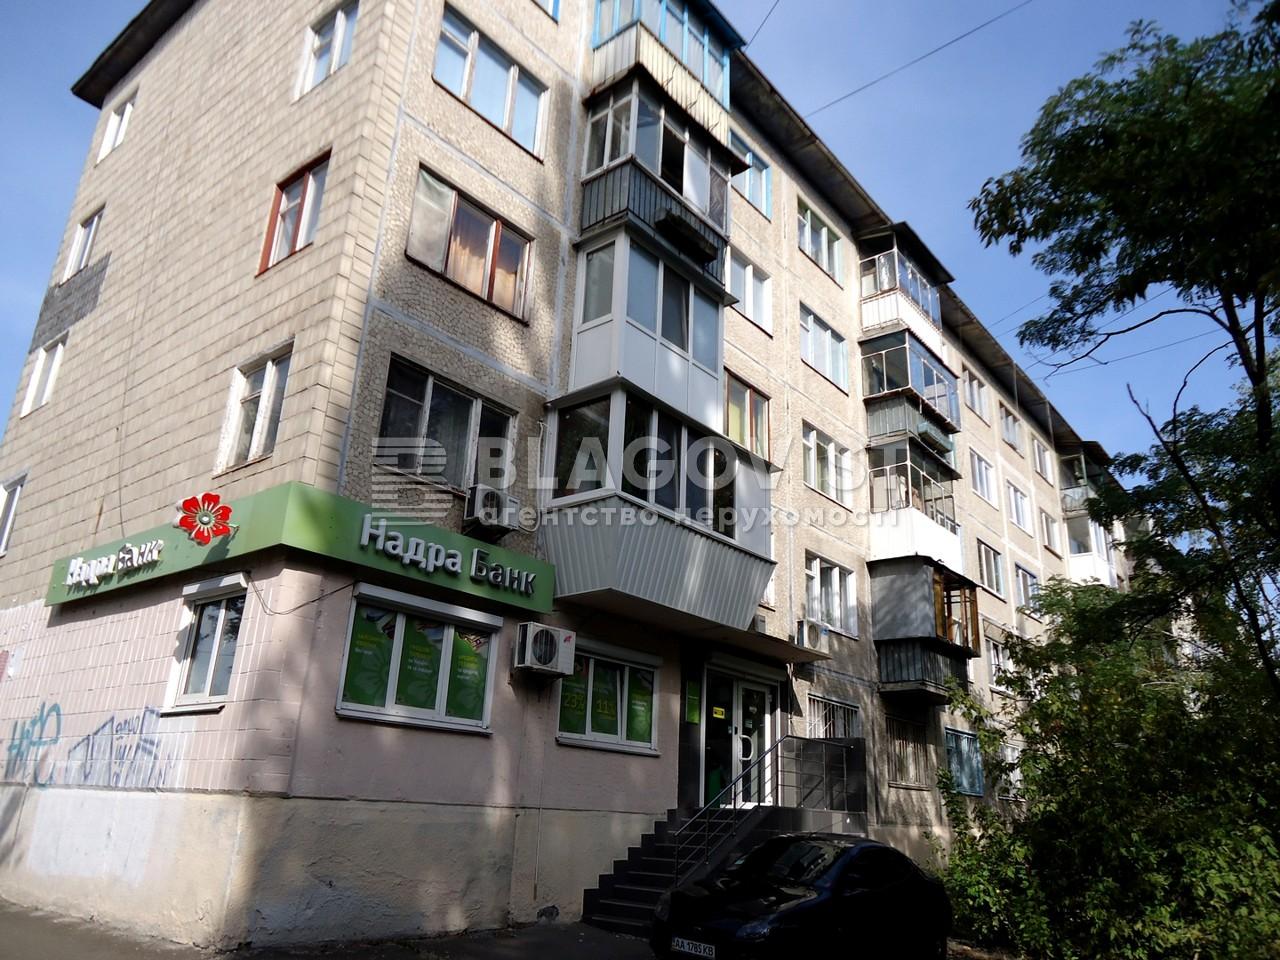 Квартира Z-811310, Братиславская, 8, Киев - Фото 1